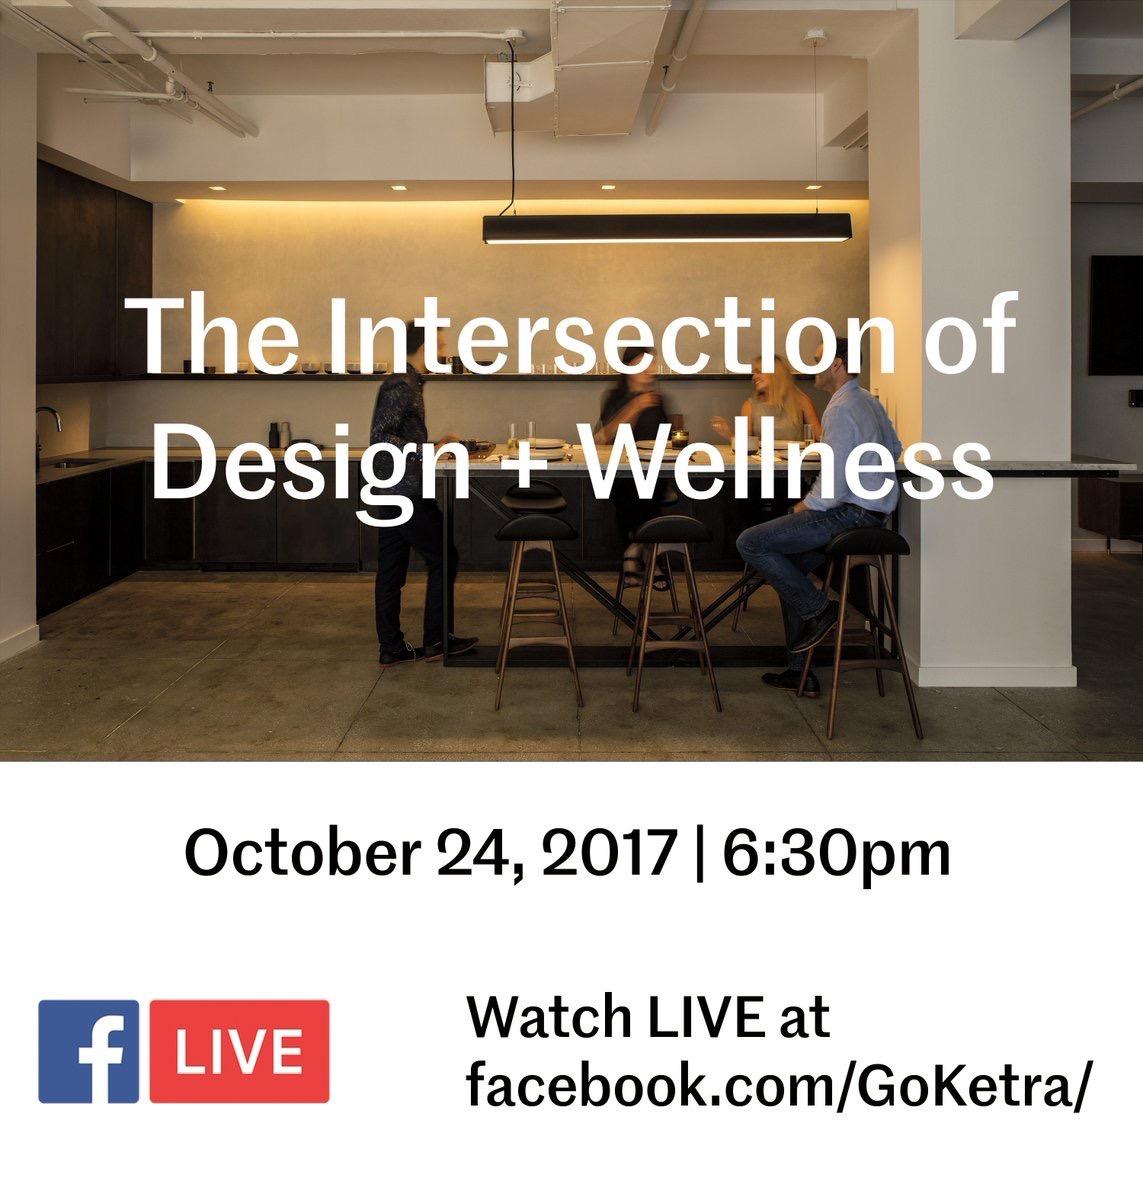 MetropolisMag  Join us LIVE tomorrow as @avirajagopal moderates The Intersection of Design+Wellness @goketra's showroom. RSVP here: goo.gl/YbQh3a pic.twitter.com/YAzp5dvK7h  Oct 23, 2017, 8:29 AM